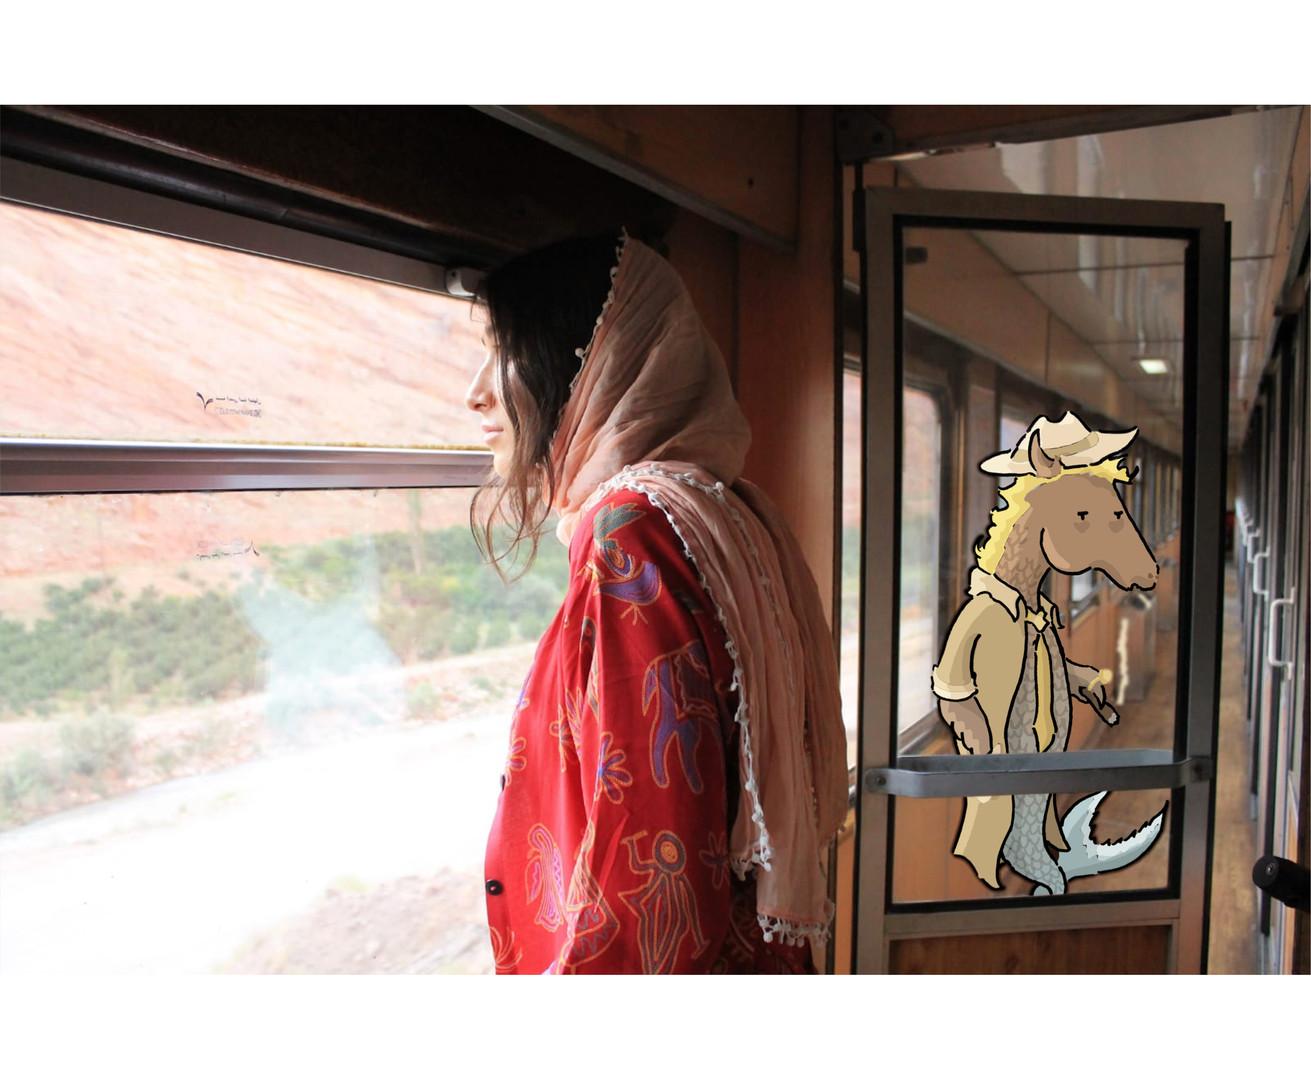 In a train .  Northern Iran